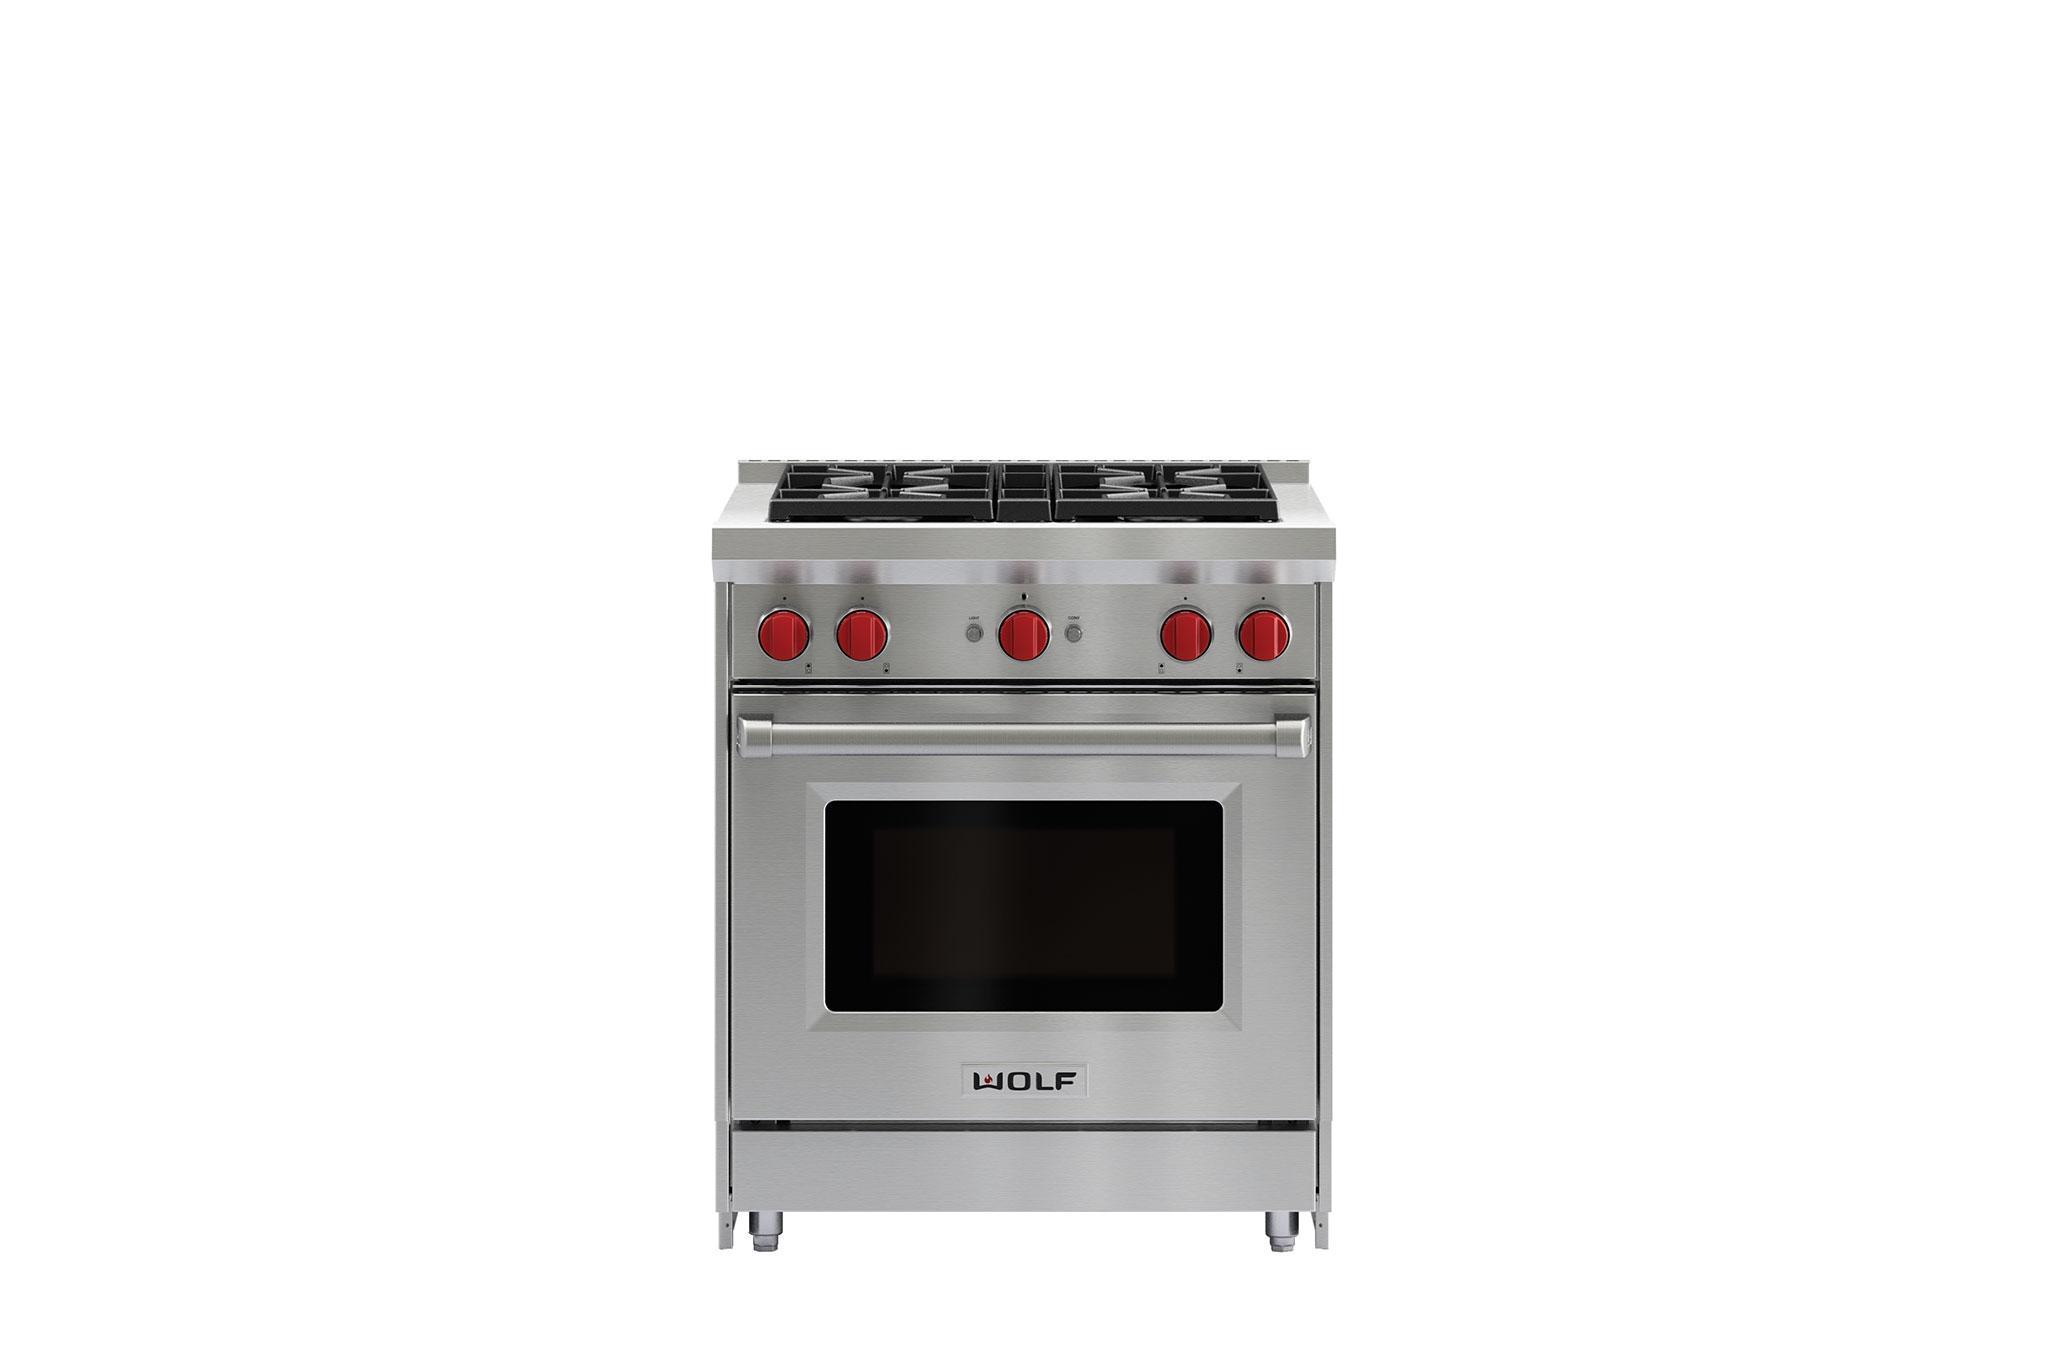 WOLF | Model # GR304 | Caplan\'s Appliances | Toronto, Ontario, Canada